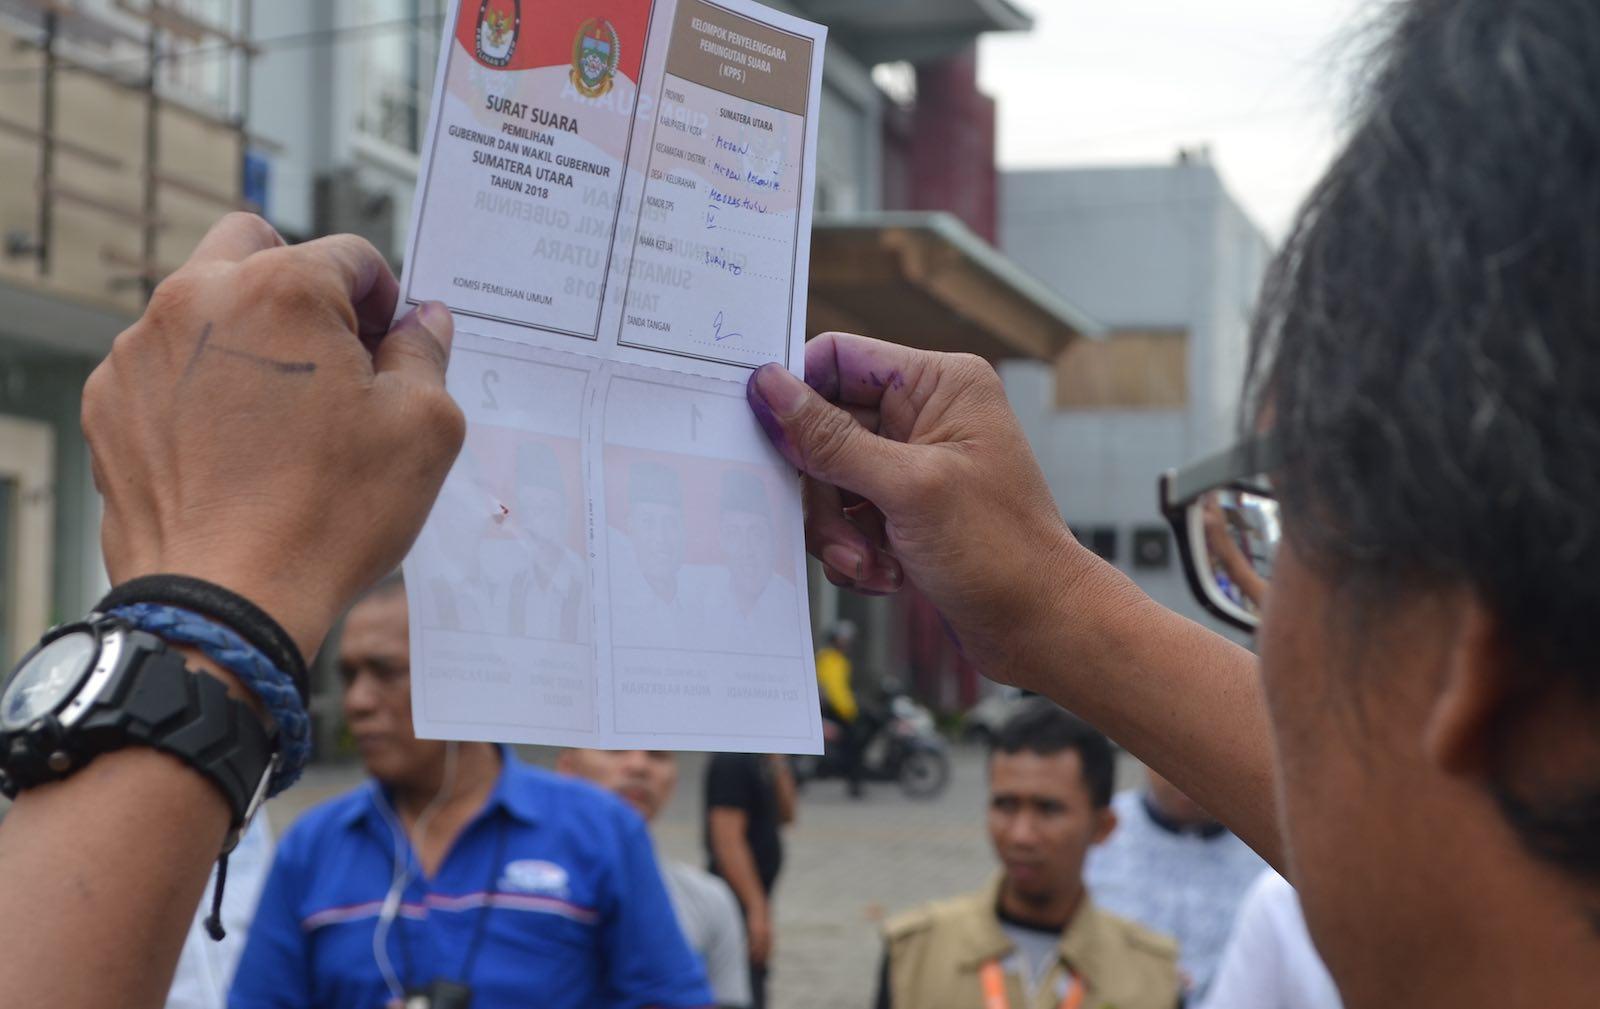 Madras Hulu polling station in Medan on 27 June (Photo: Teguh Harahap)